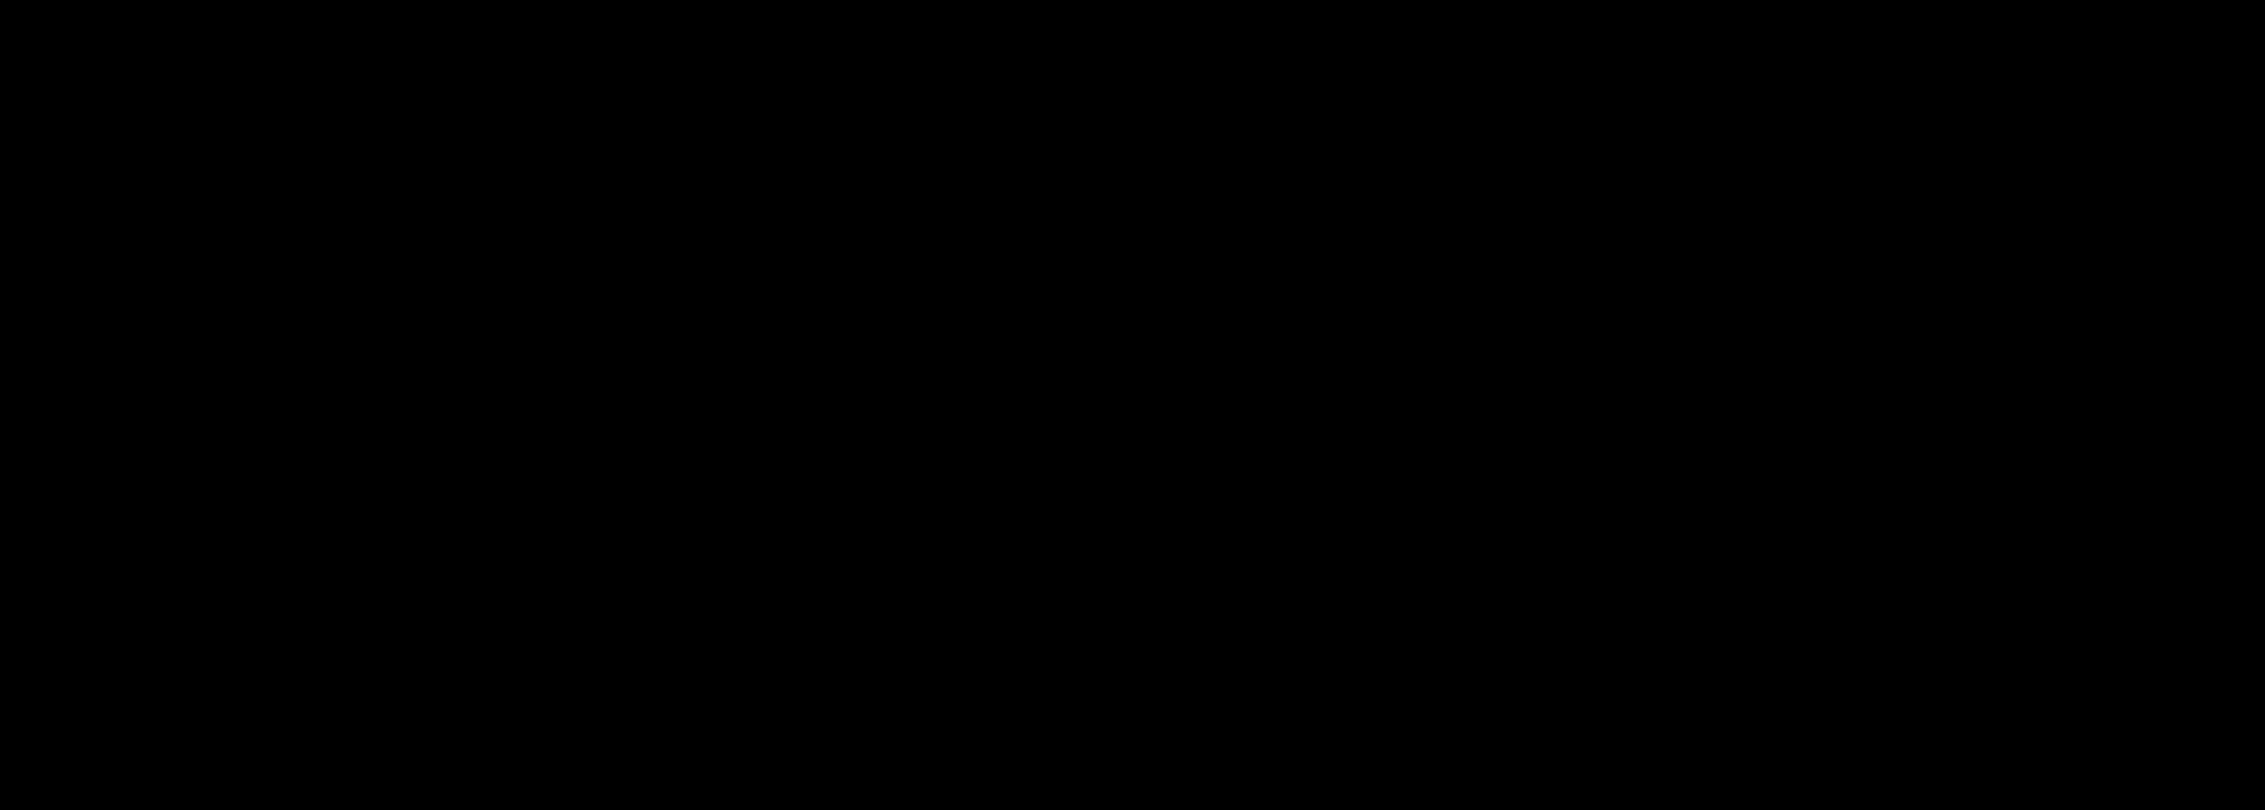 collection of black. Garland clipart potluck